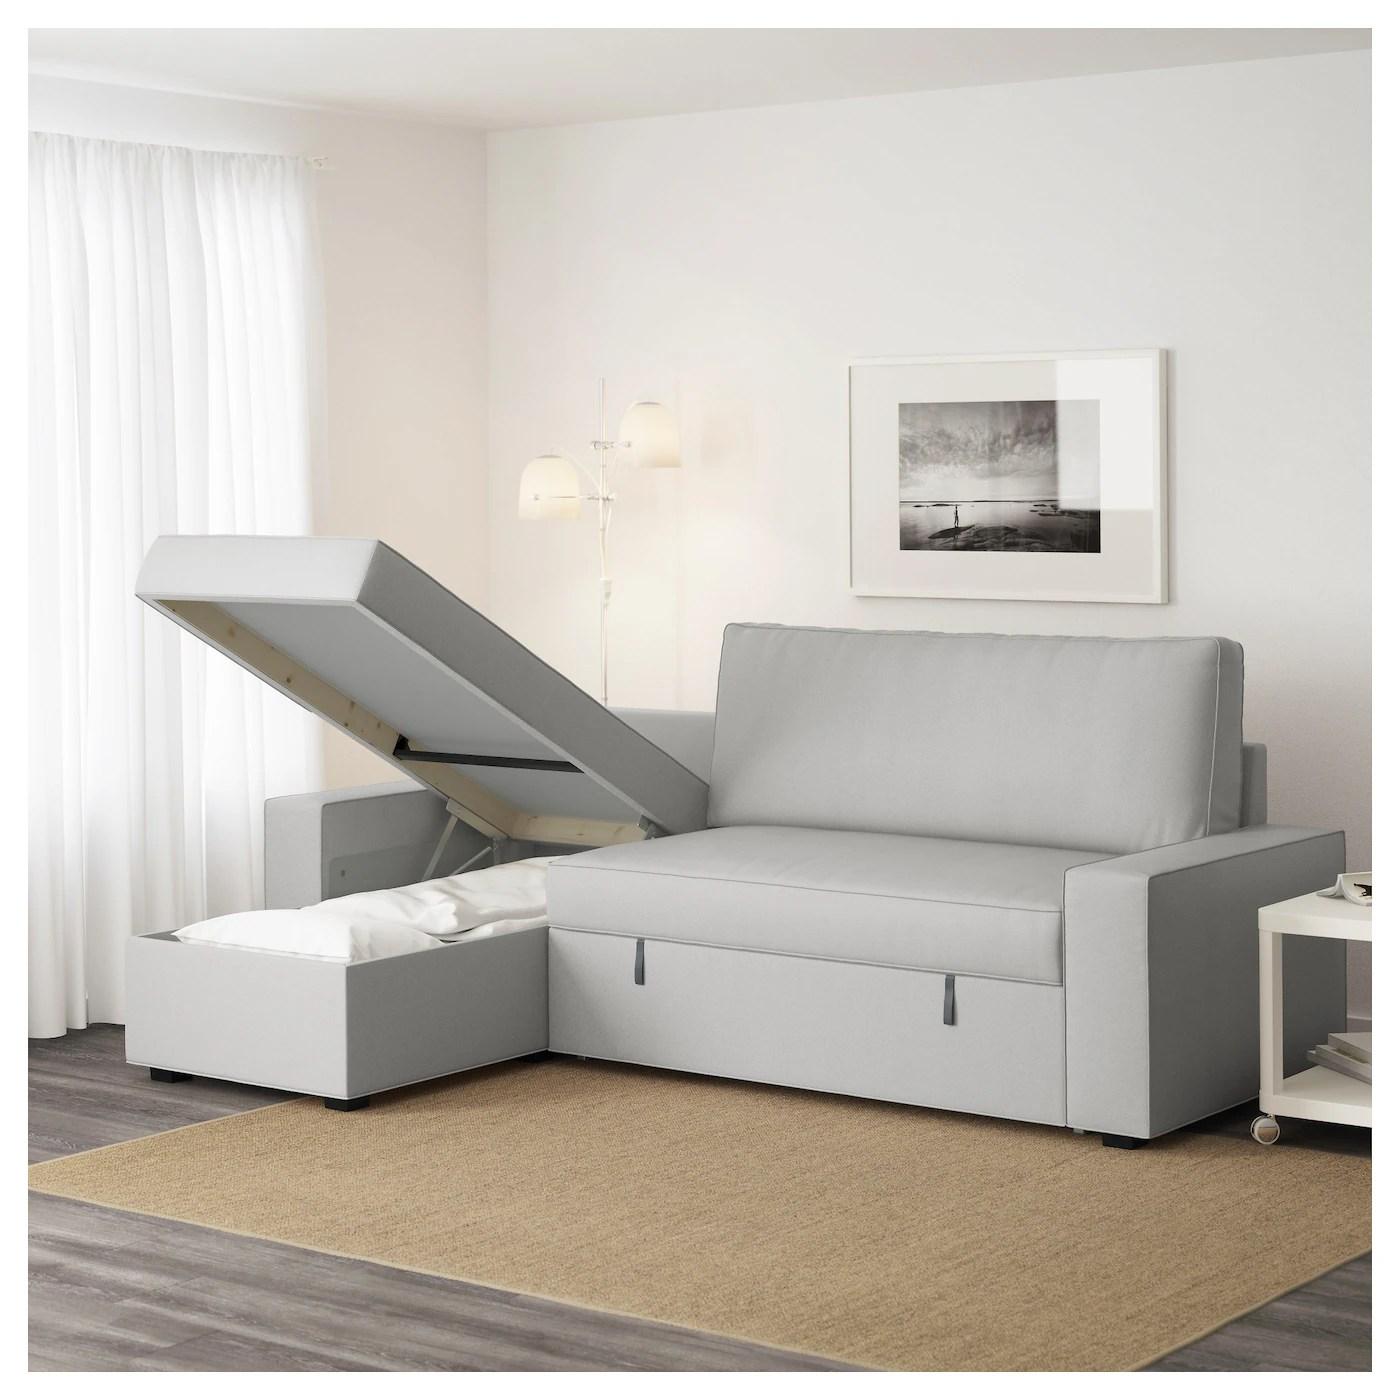 ikea sleeper sofa with chaise bed indonesia vilasund longue ramna light grey